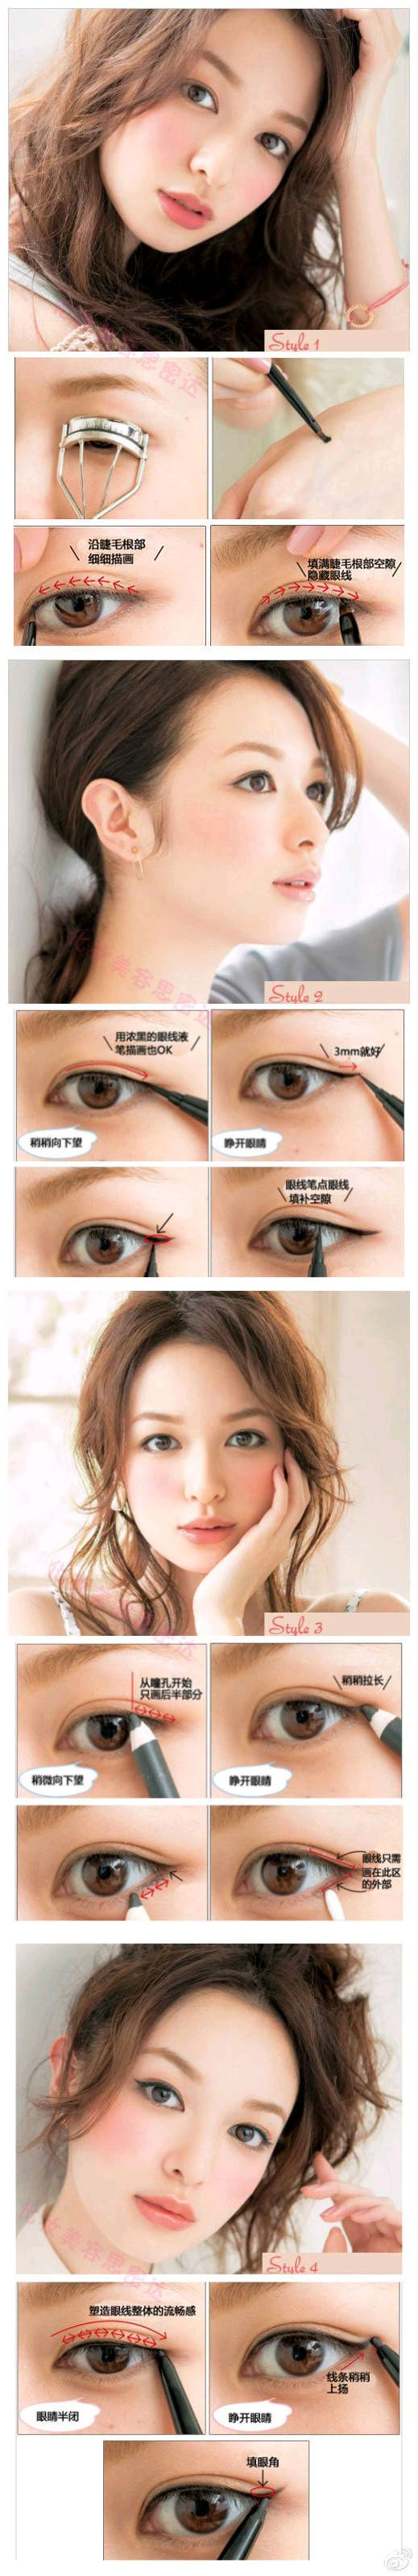 Different eye make up looks eye make-up tutorial korean,asian